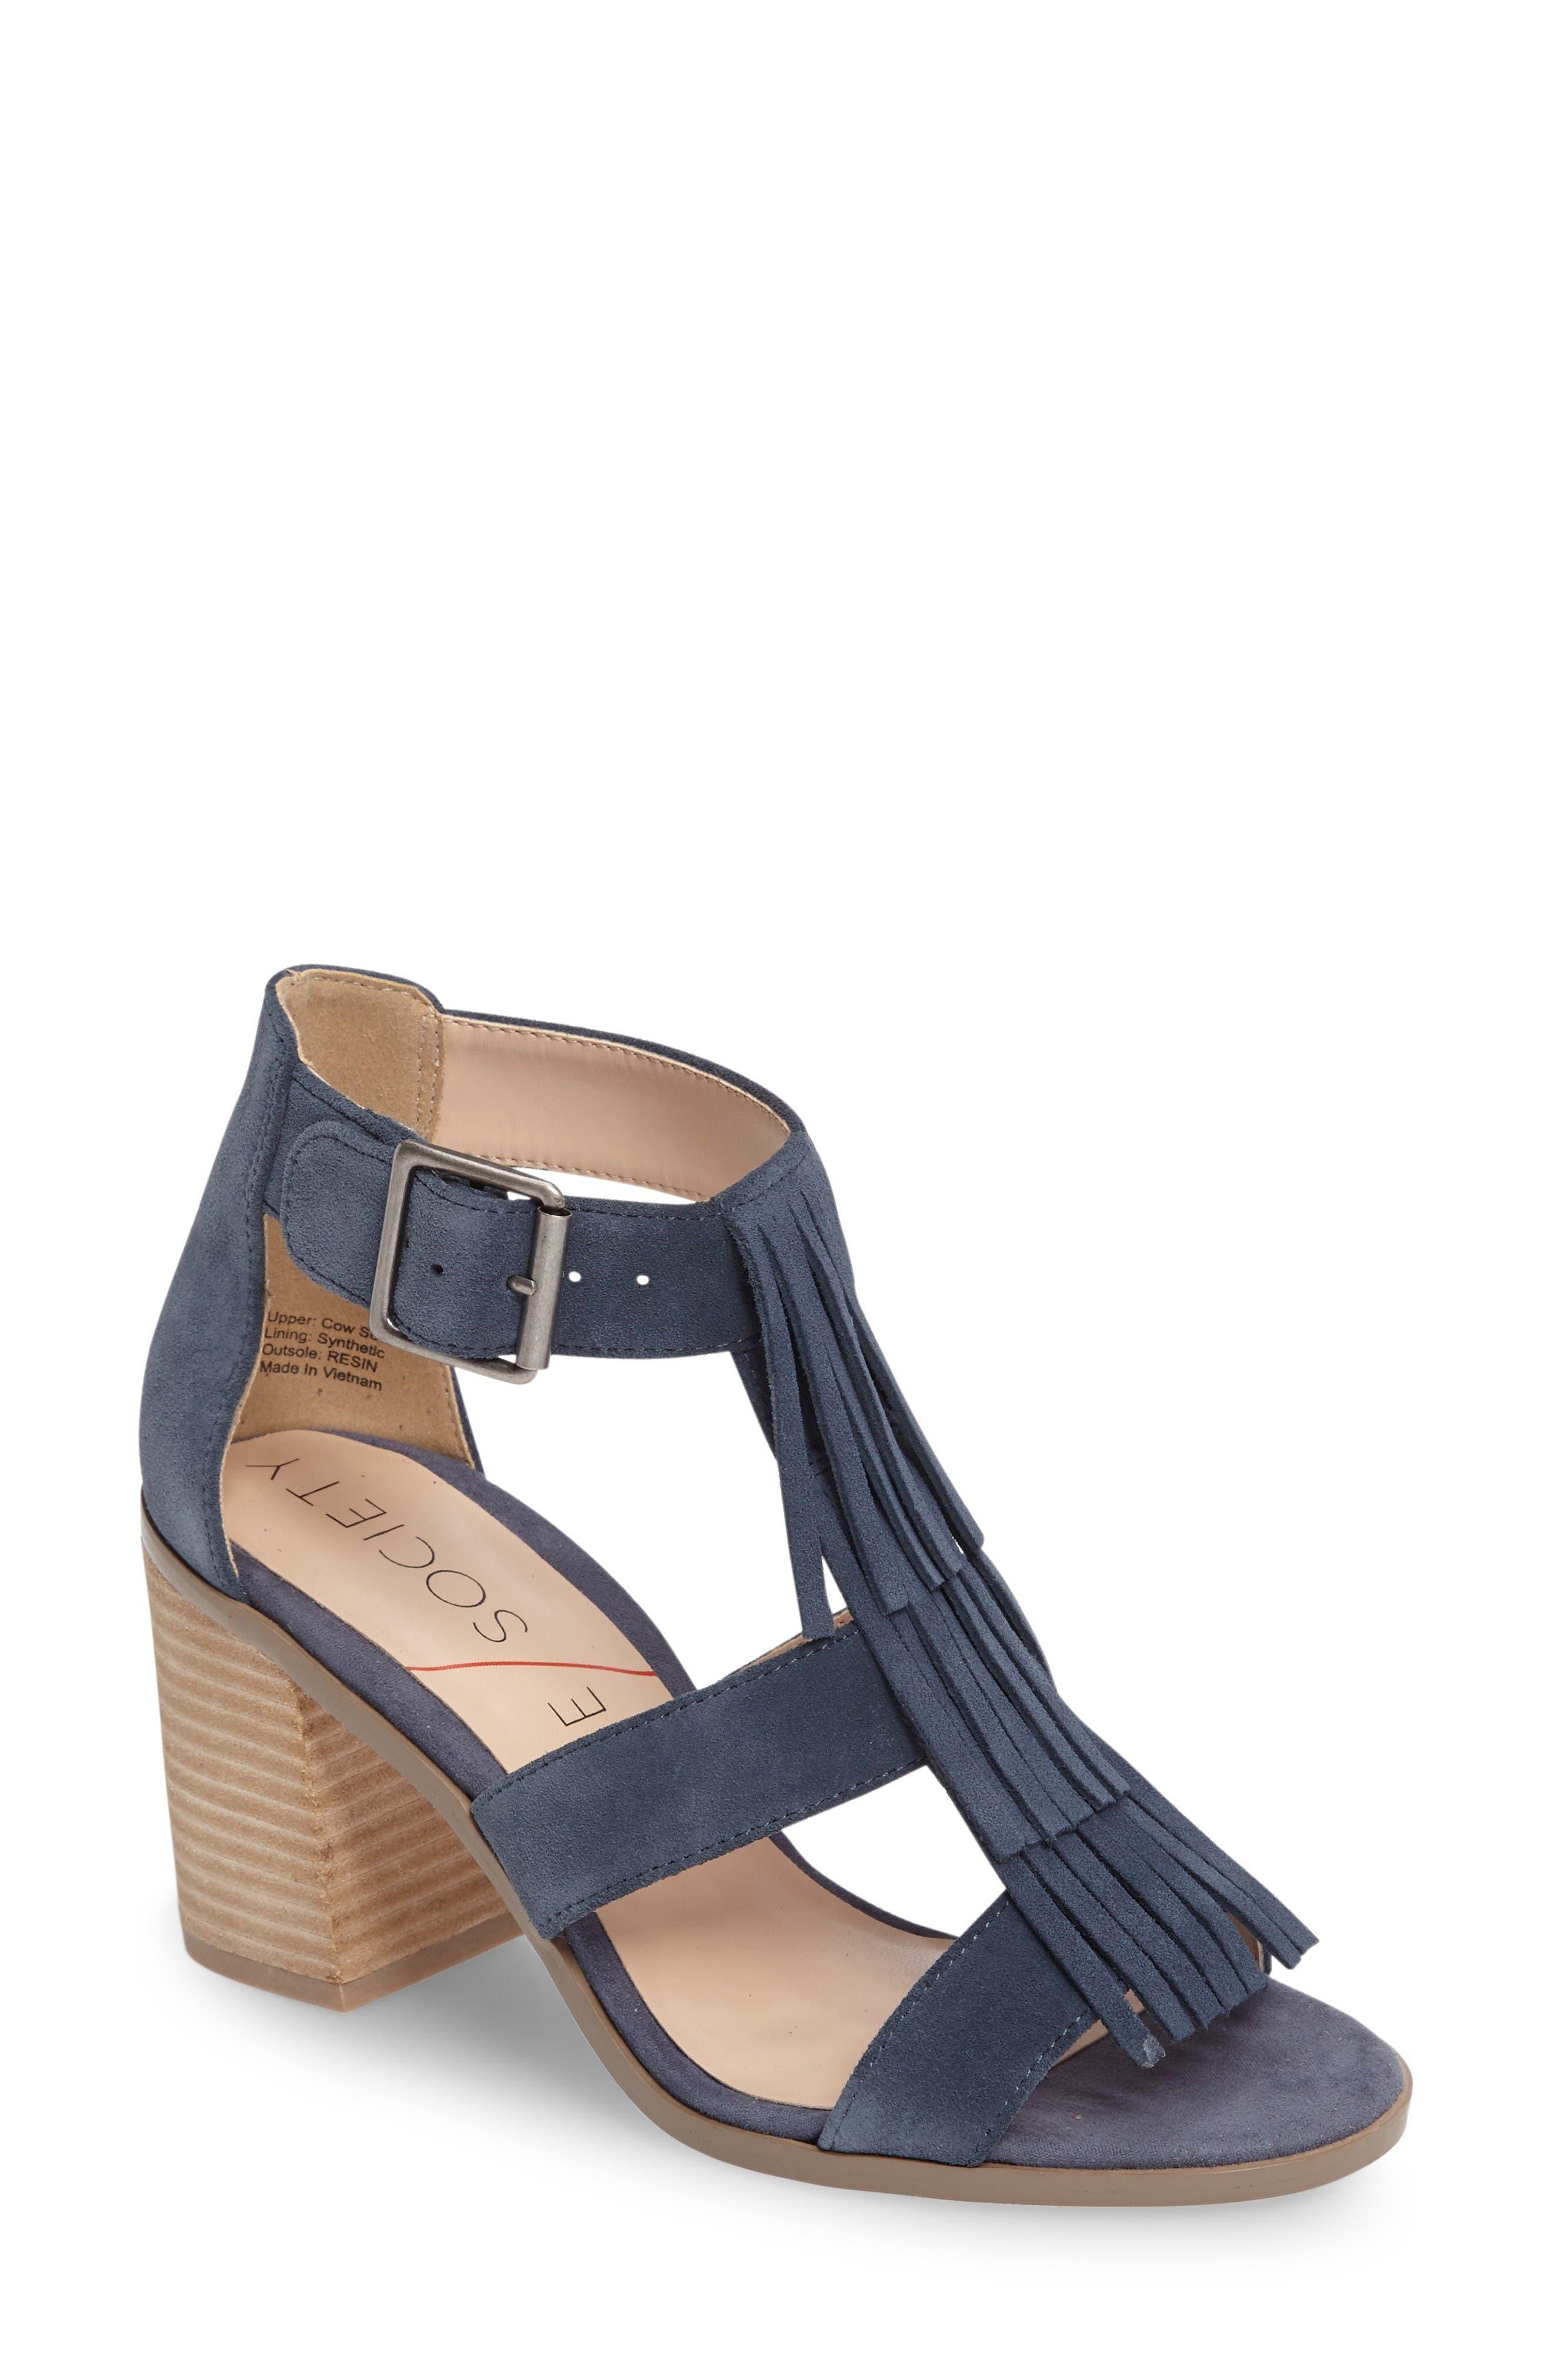 'Delilah' Fringe Sandal,                             Main thumbnail 1, color,                             Vista Blue